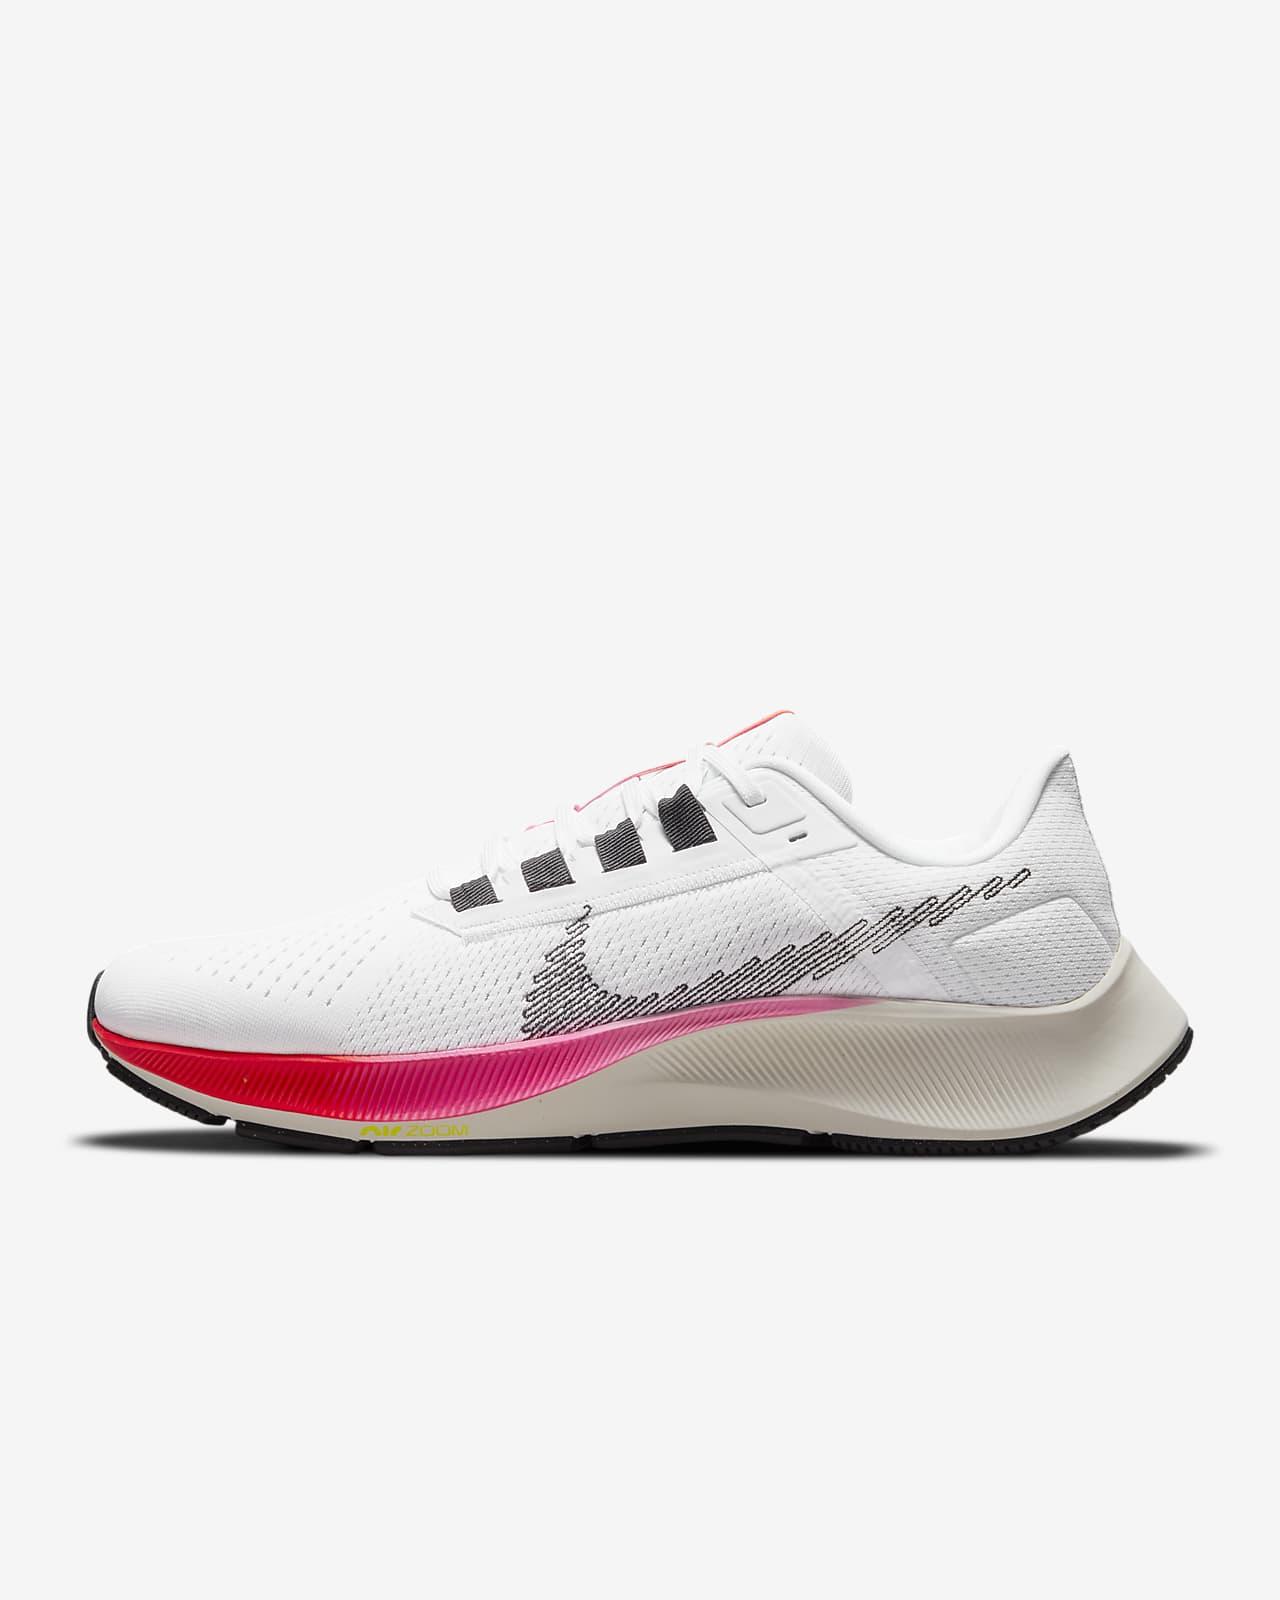 Calzado de running de carretera para hombre Nike Air Zoom Pegasus 38